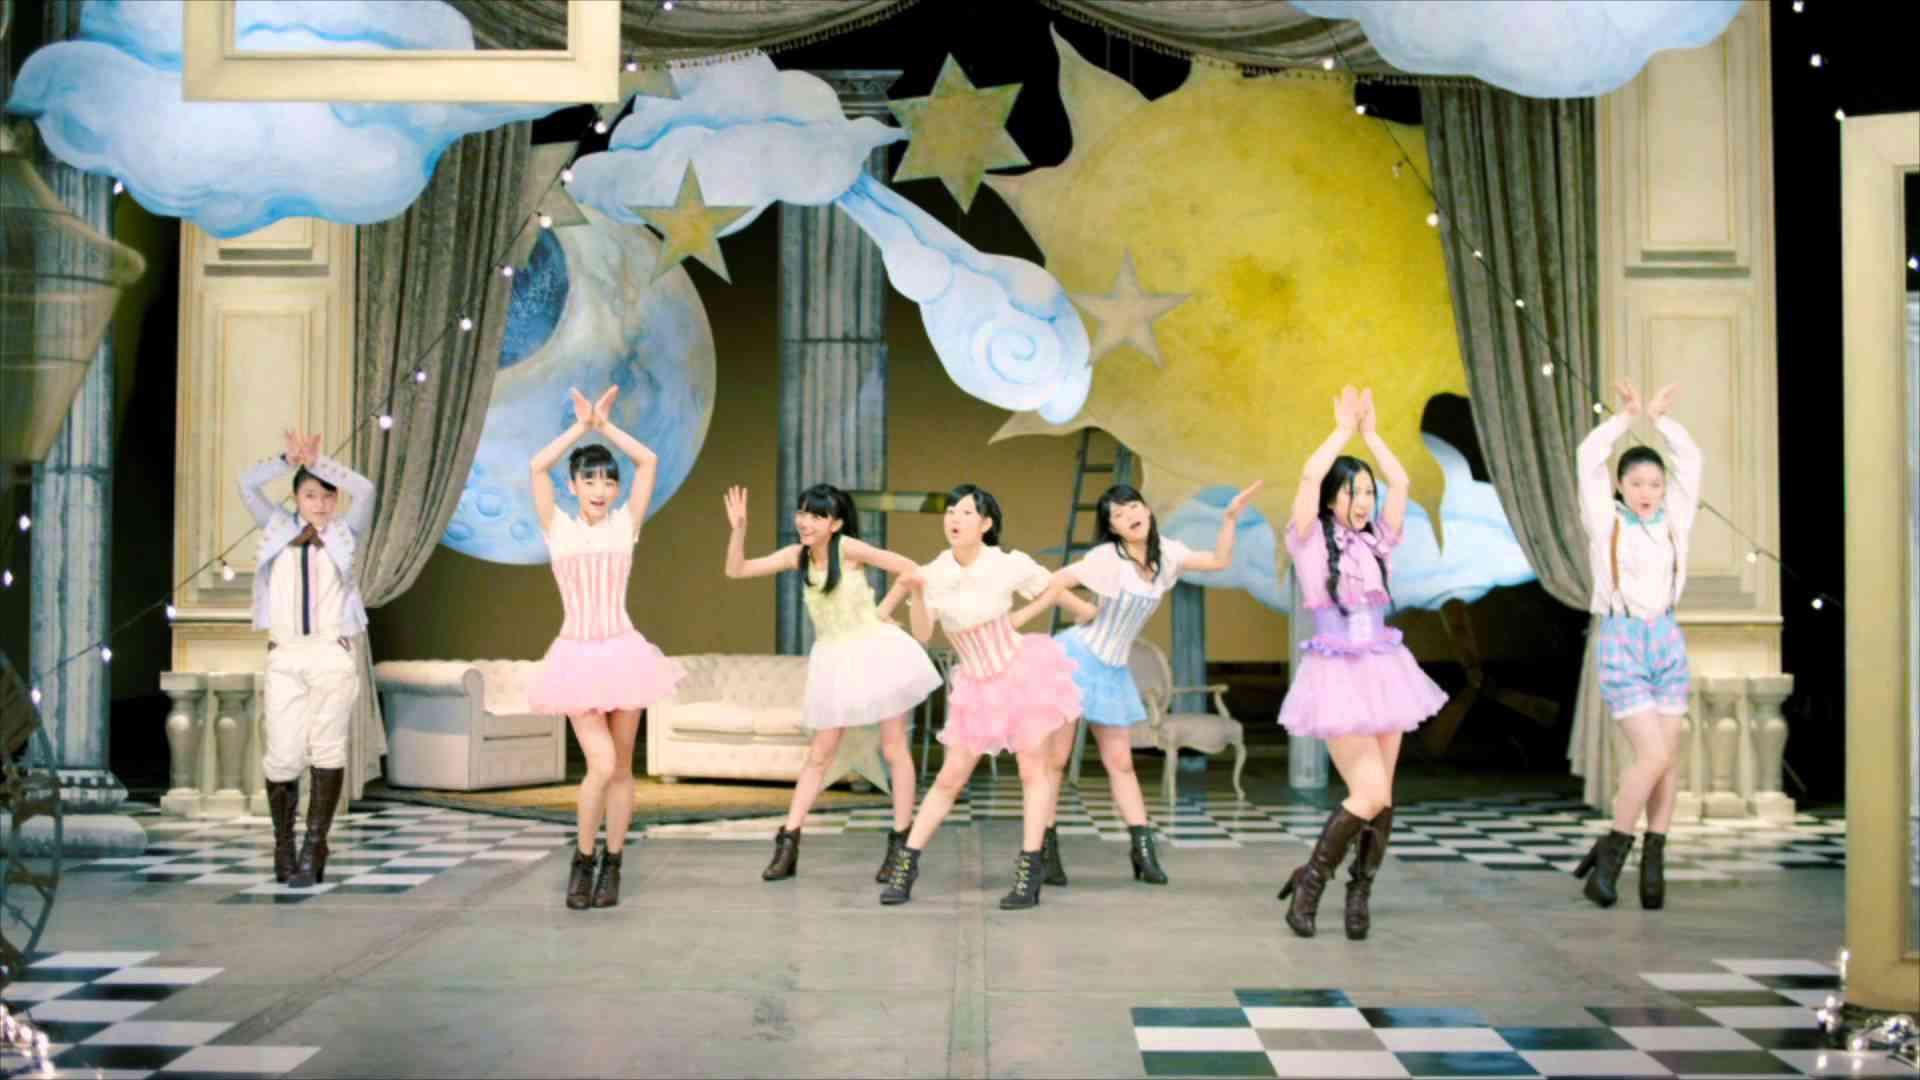 [PV]フェアリーズ / Tweet Dream(Full Ver.) Fairies - YouTube